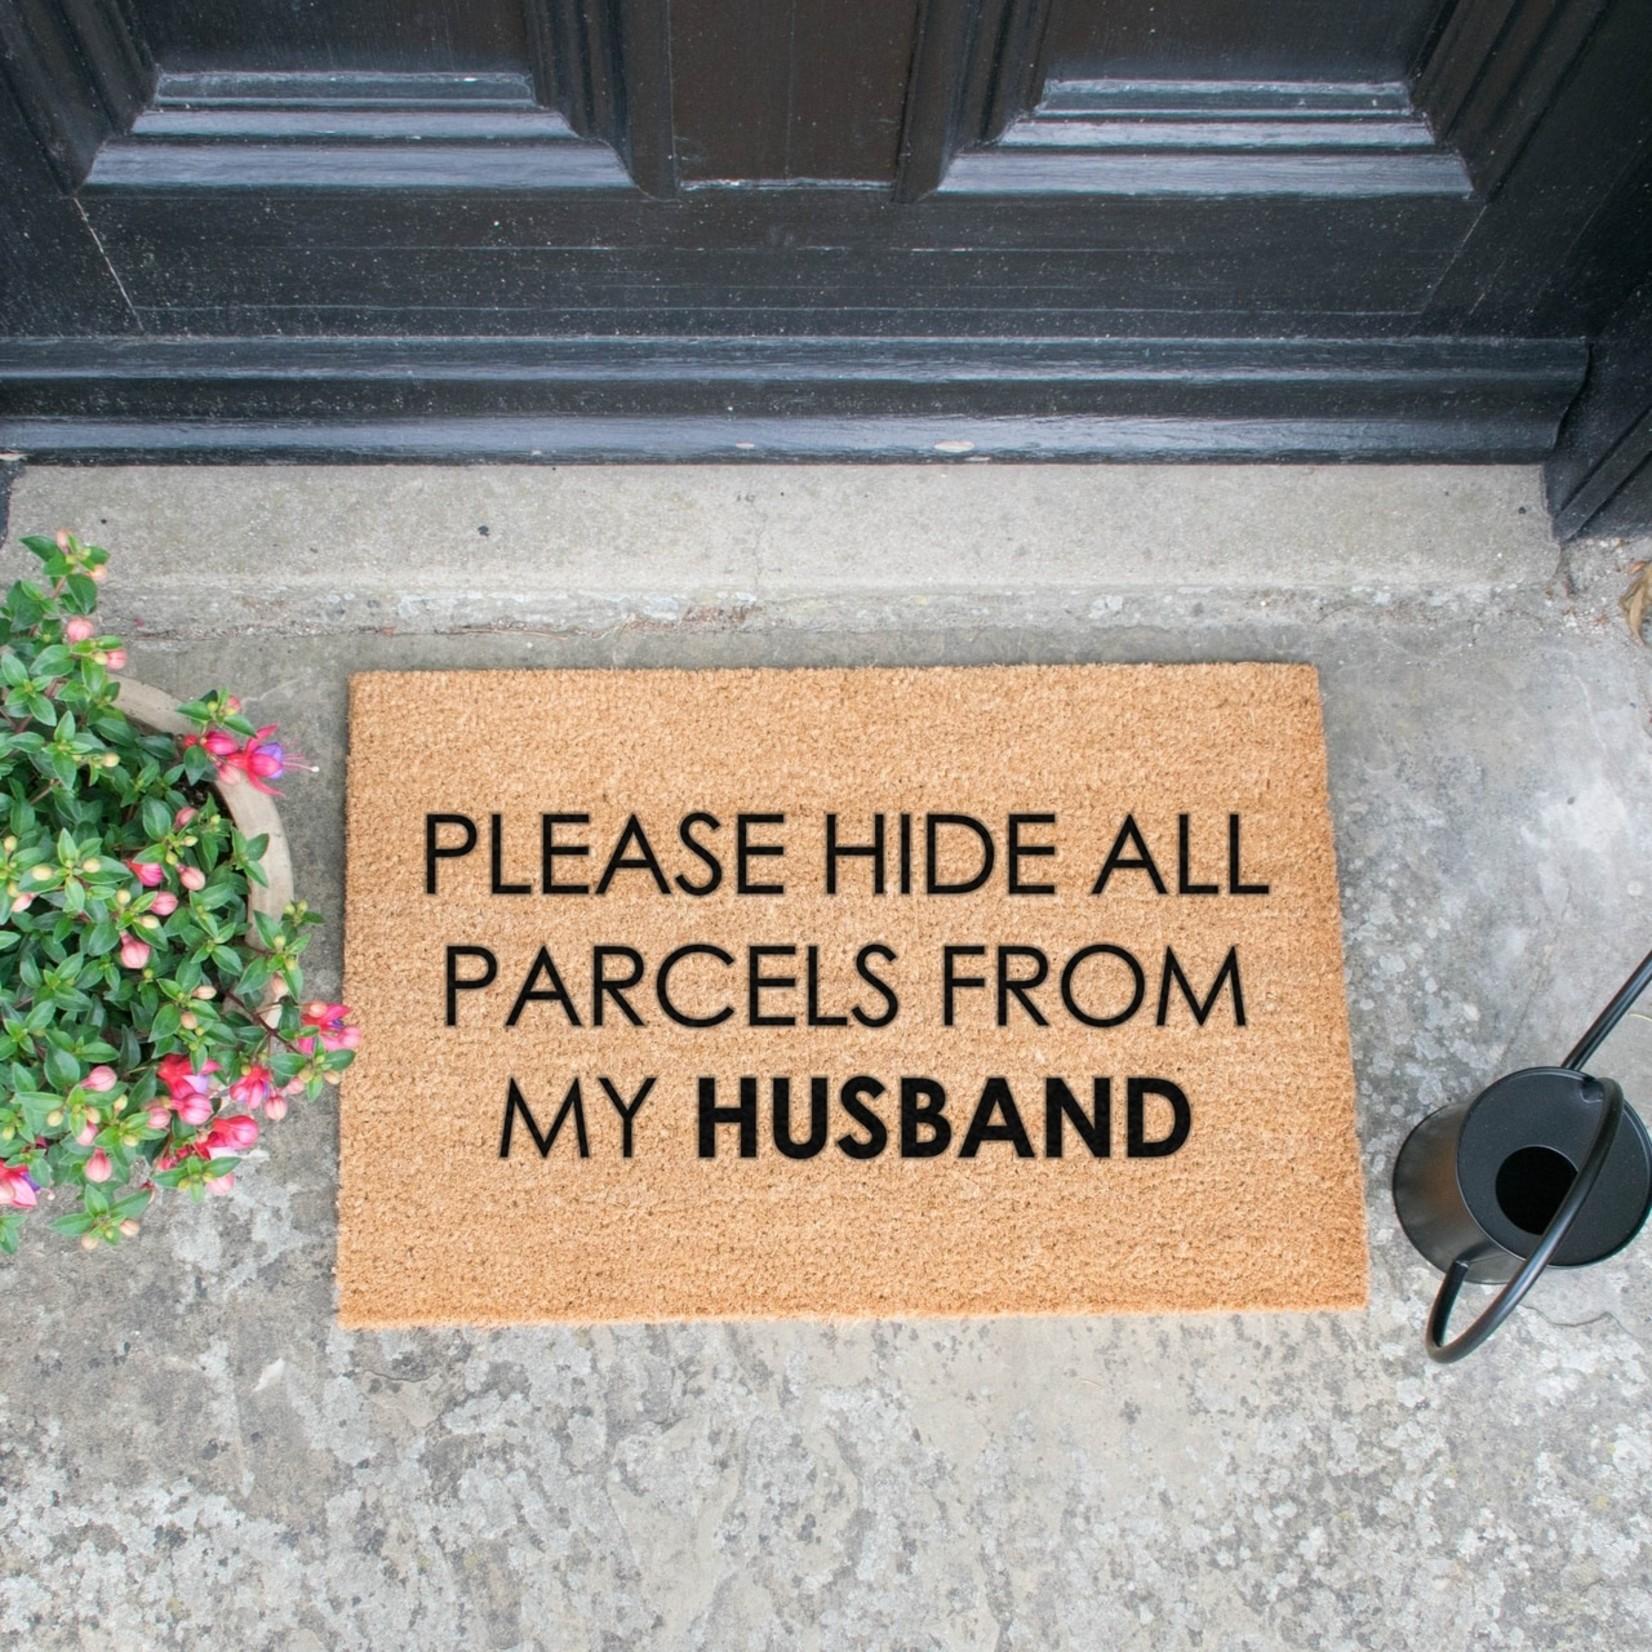 Deurmat kokos- Please hide all parcels from my husband